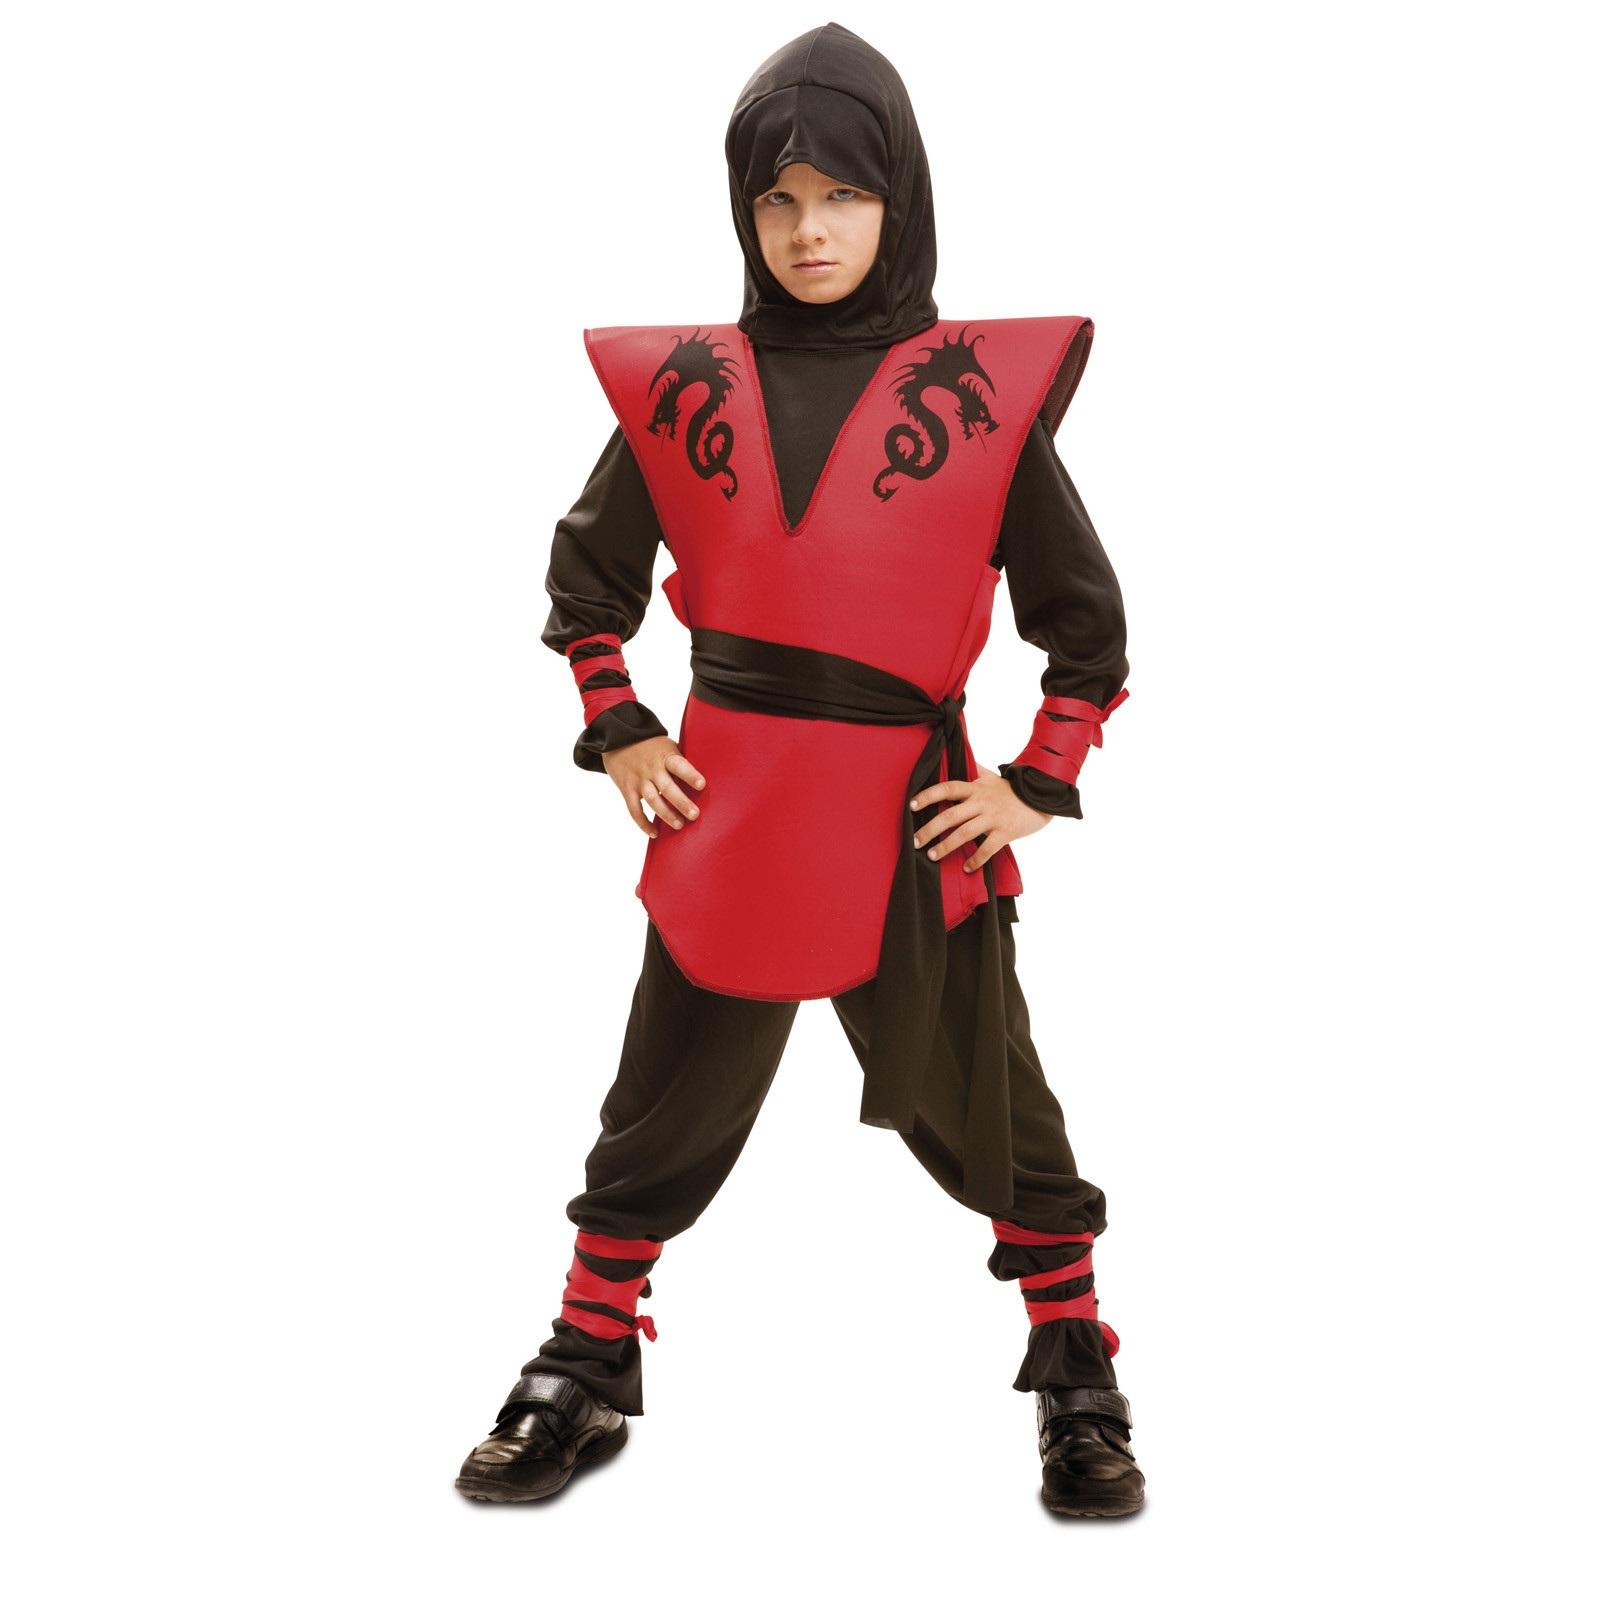 disfraz ninja dragón niño 202044mom - DISFRAZ DE NINJA DRAGON NIÑO